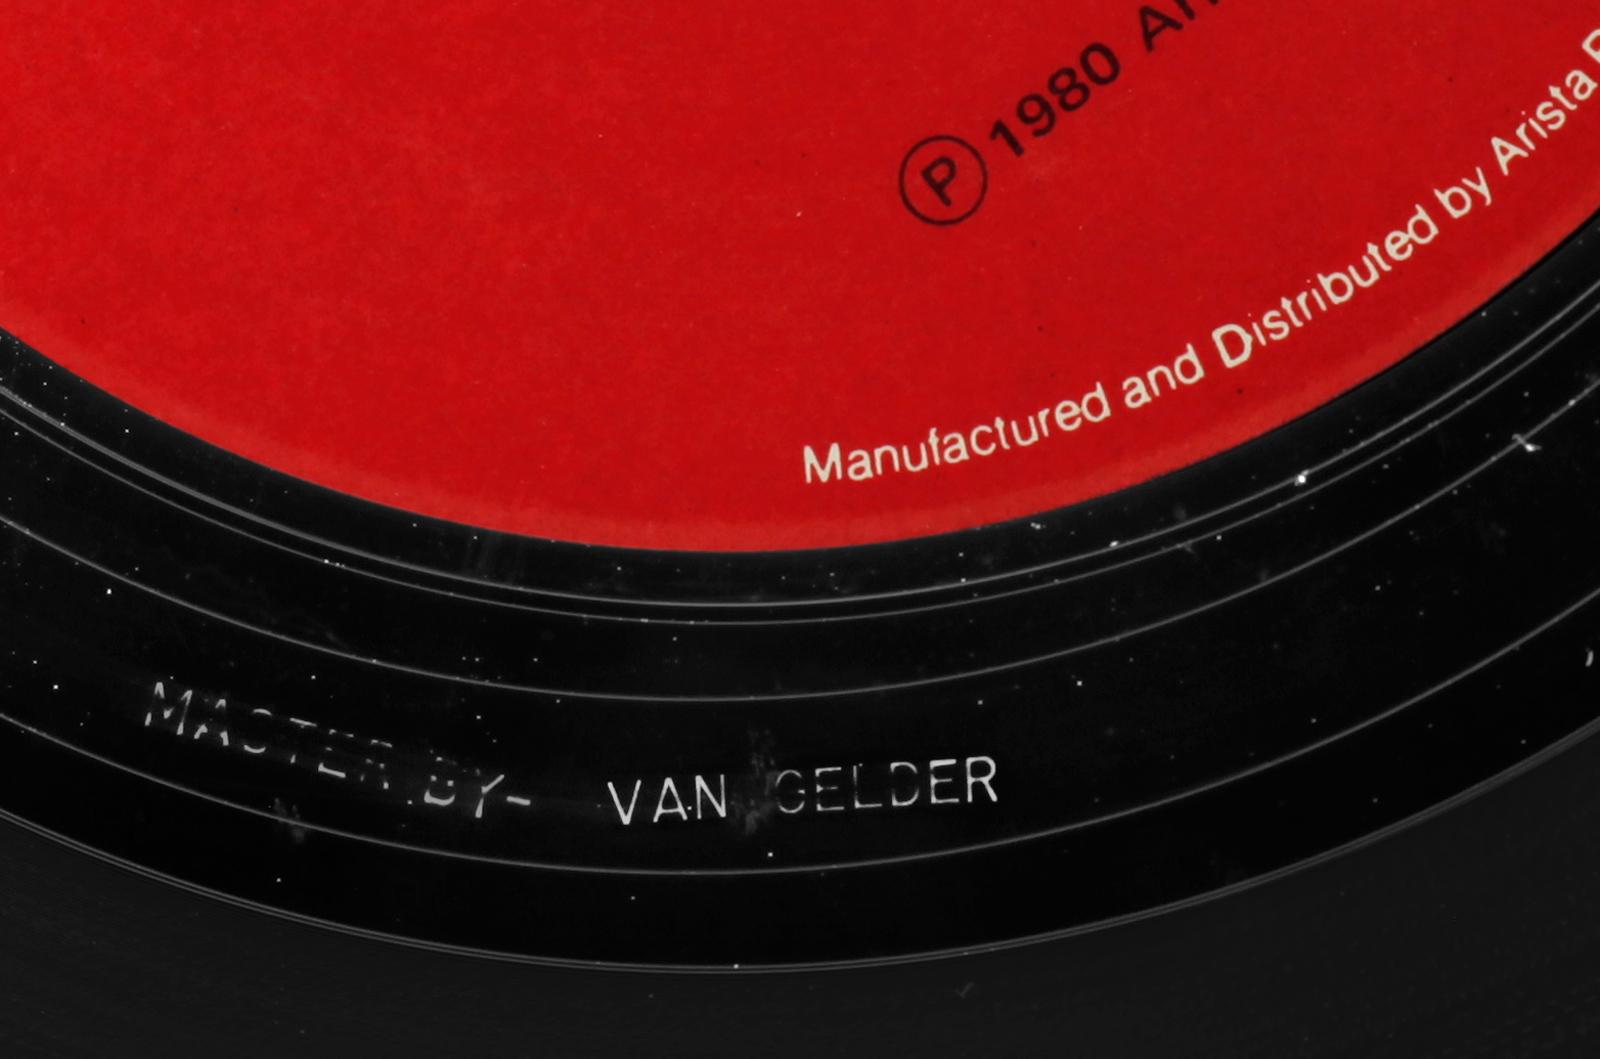 What Rudy Did Next Master By Van Gelder 80s